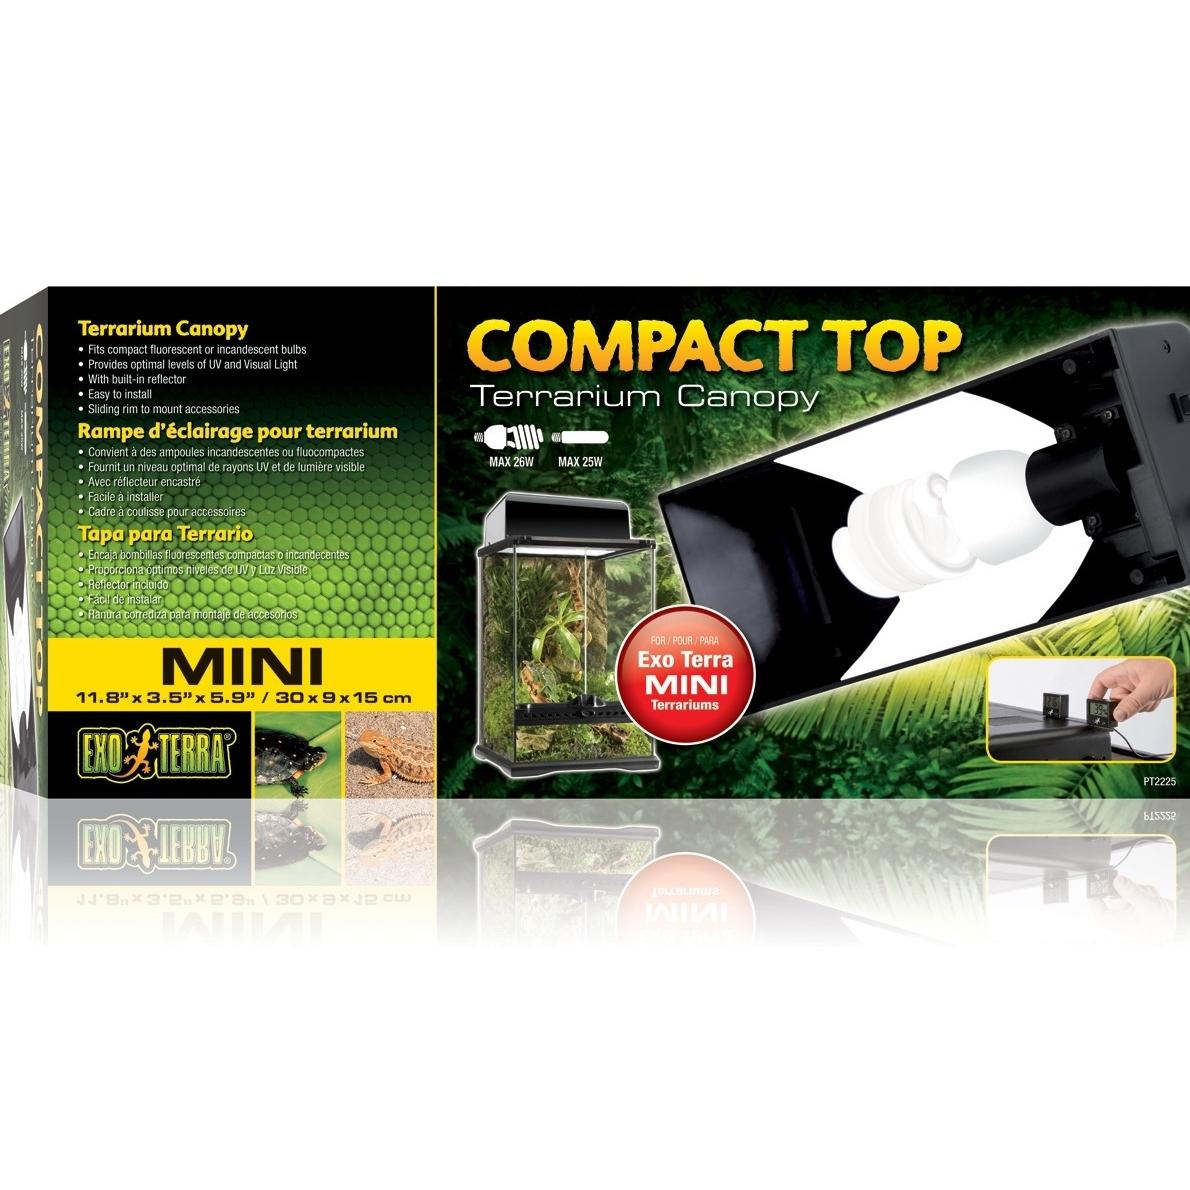 Exo Terra Compact Top - Abdeckung für Terrarienlampen, Bild 2